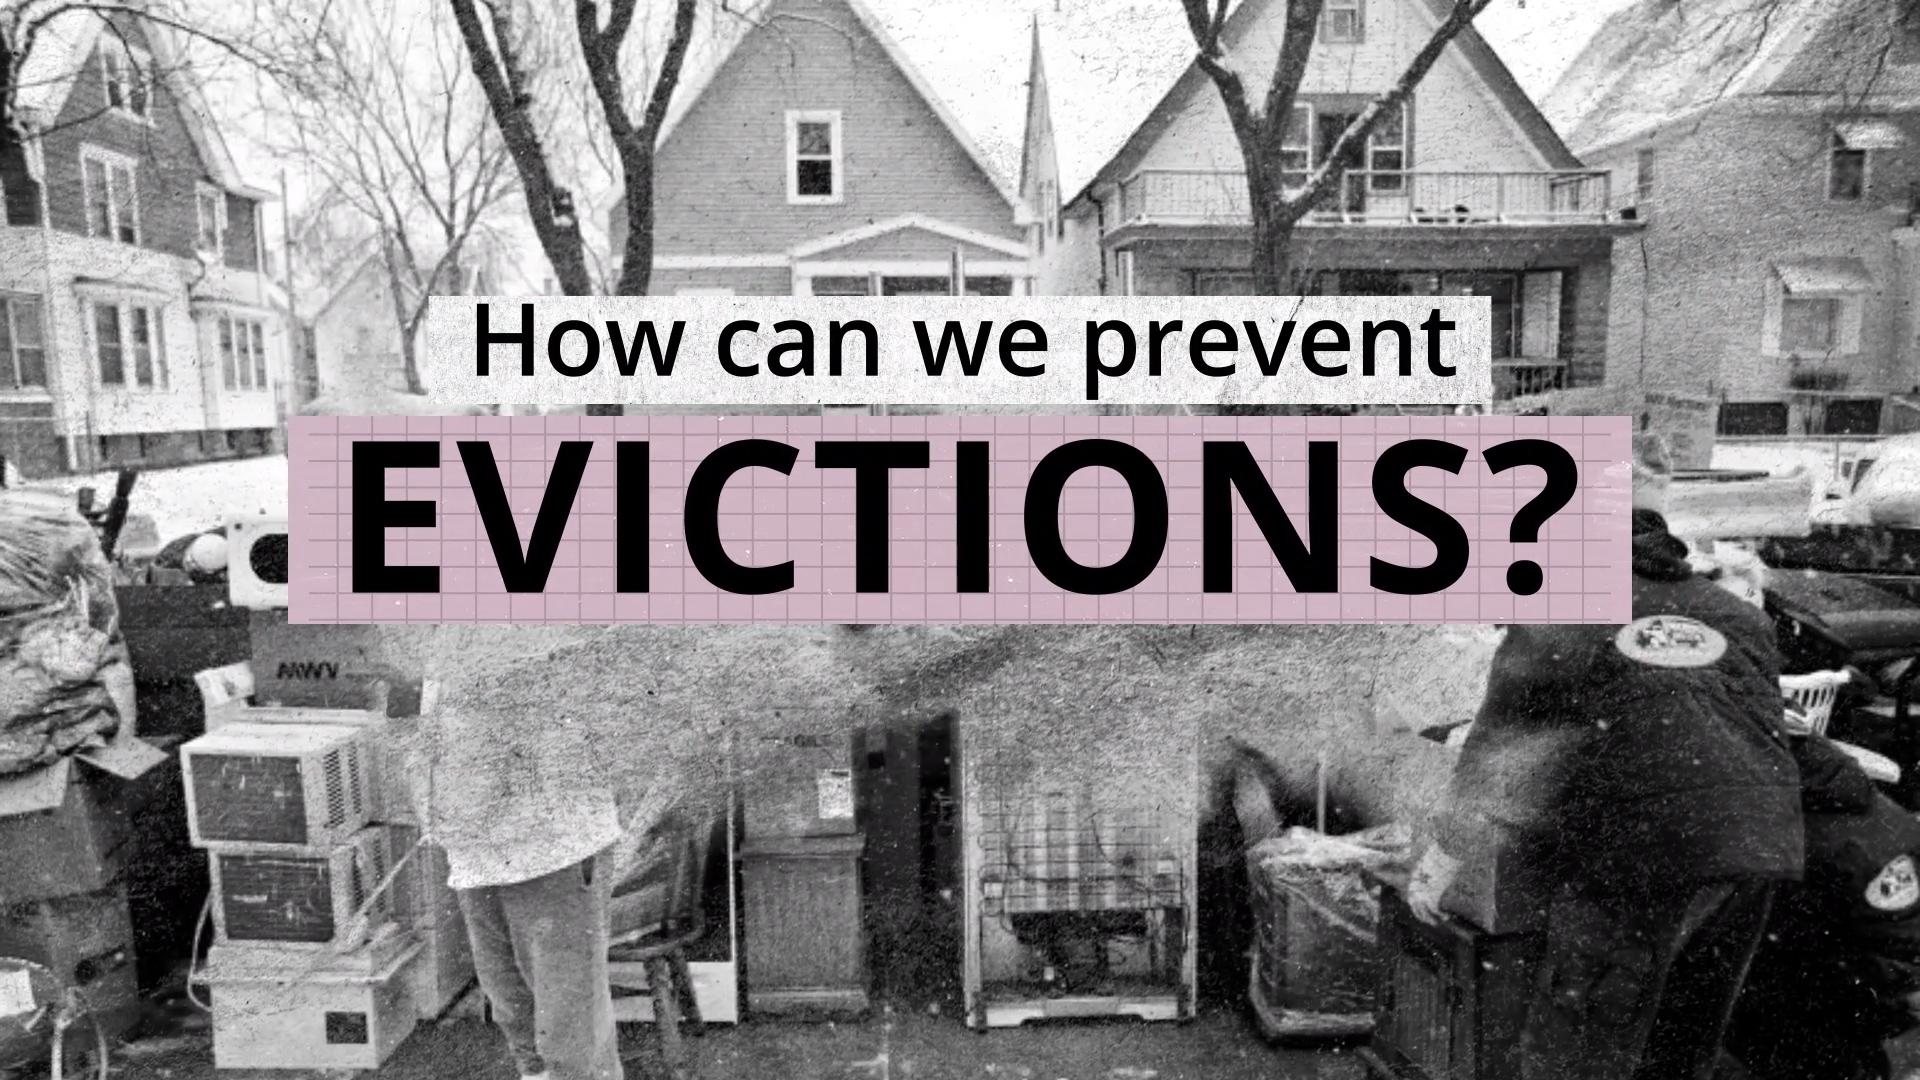 Howcanwepreventevictions